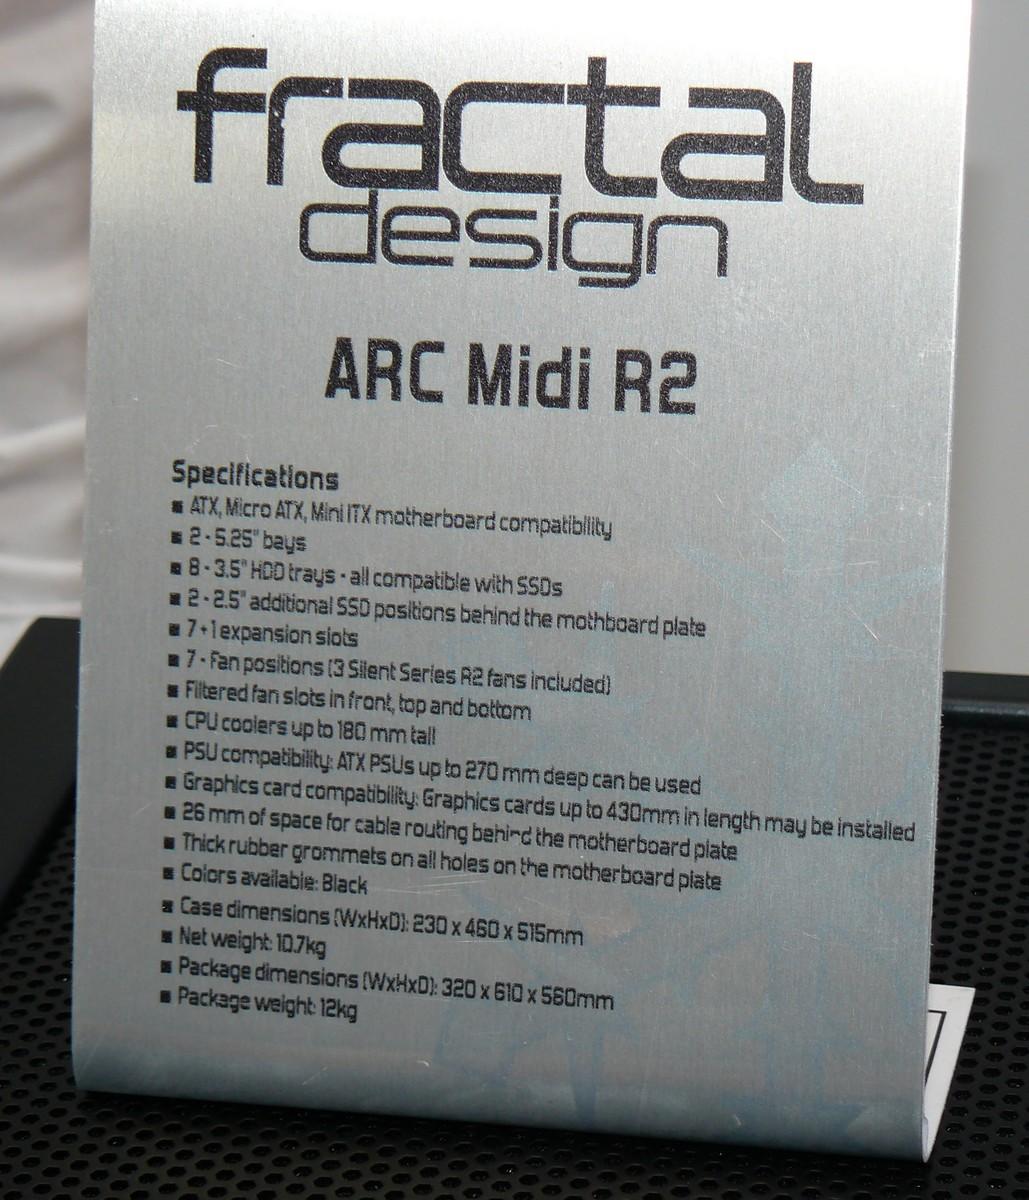 Arc Midi R2 Specs